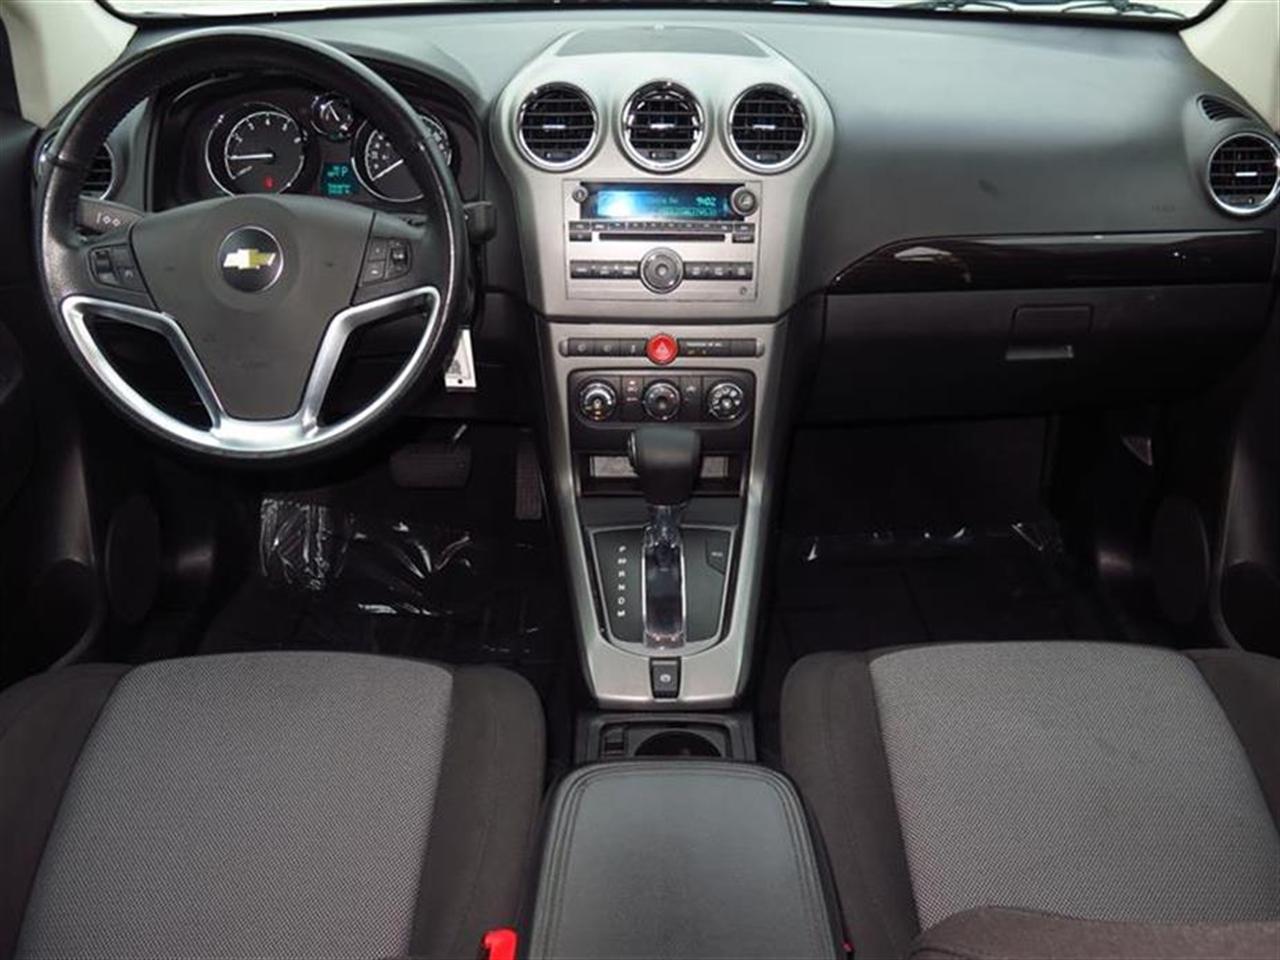 2014 CHEVROLET CAPTIVA SPORT FLEET FWD 4dr LT 34220 miles Air conditioning single-zone automati